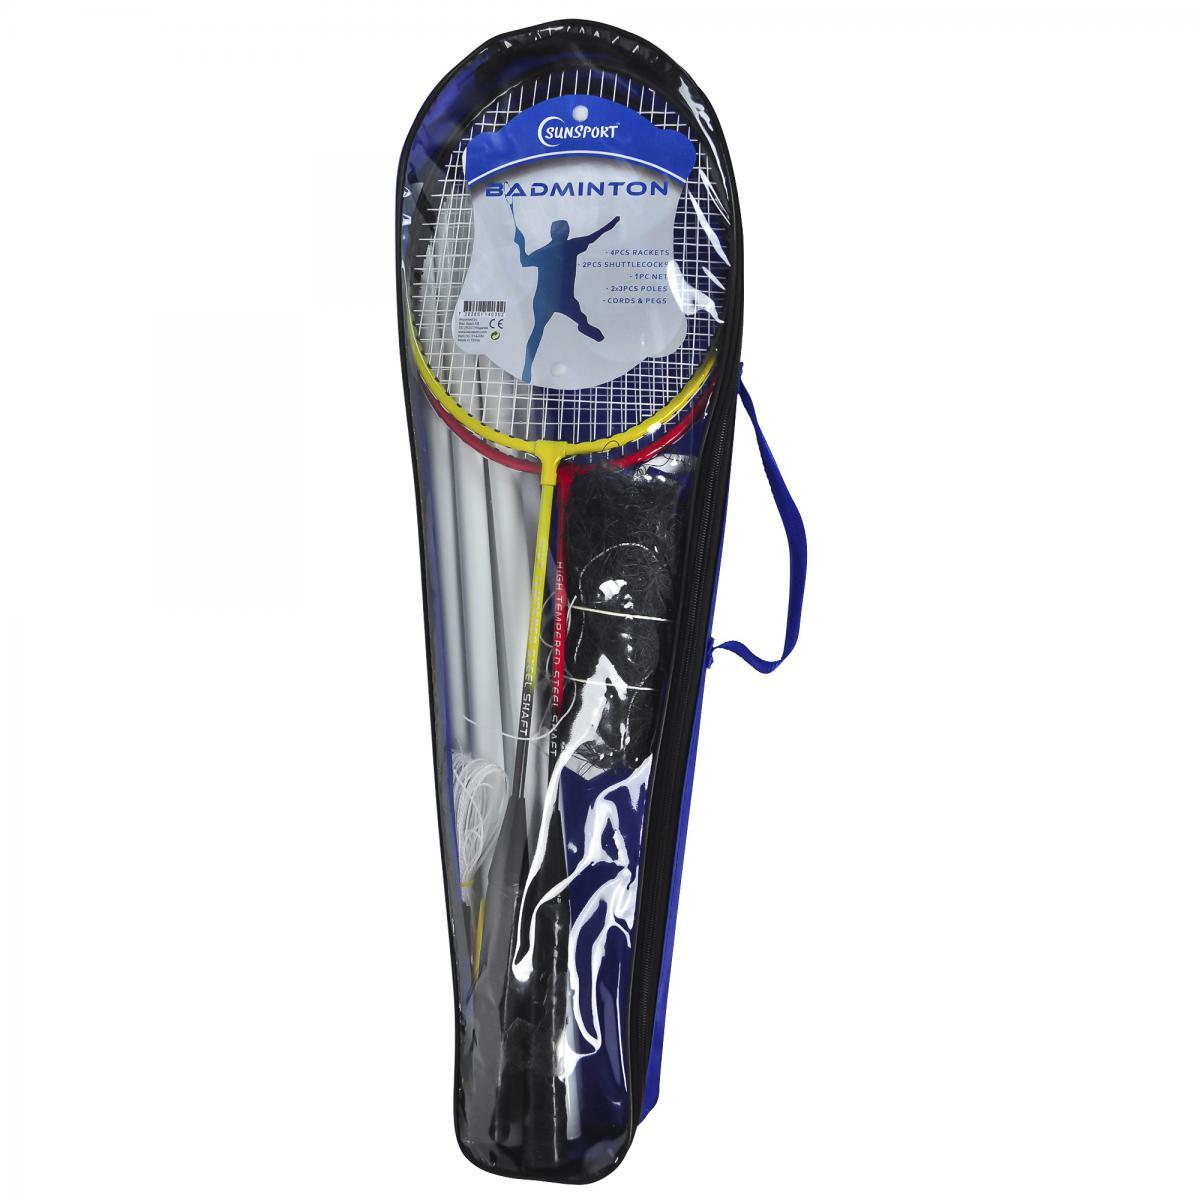 SunSport  Badminton Sett 4 Personer